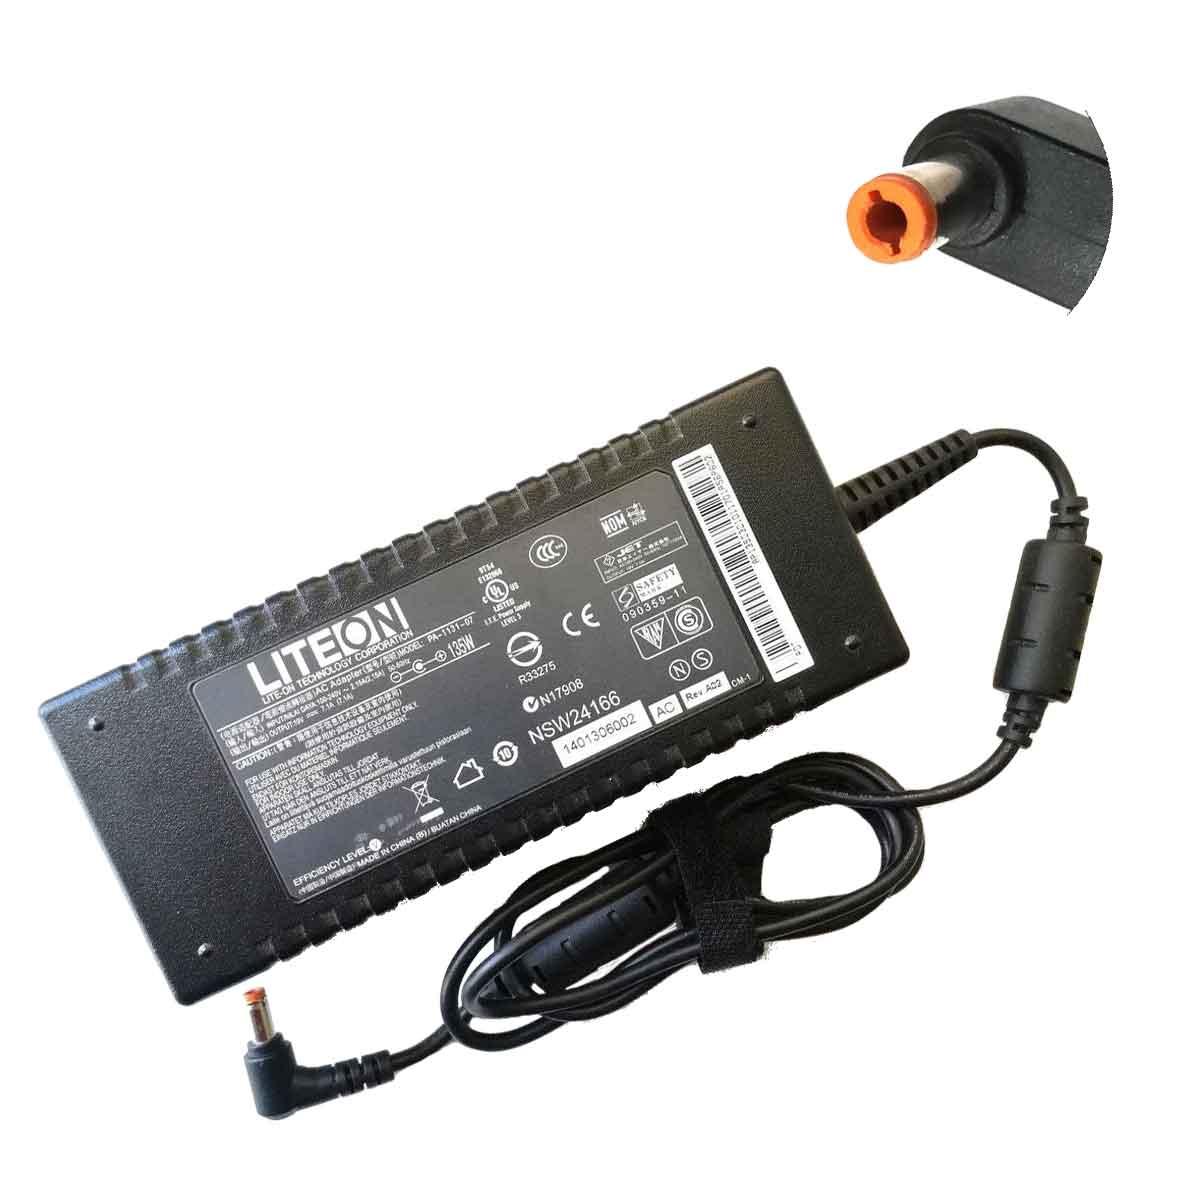 شارژر لپ تاپ لنوو 19 ولت 7.1 آمپر